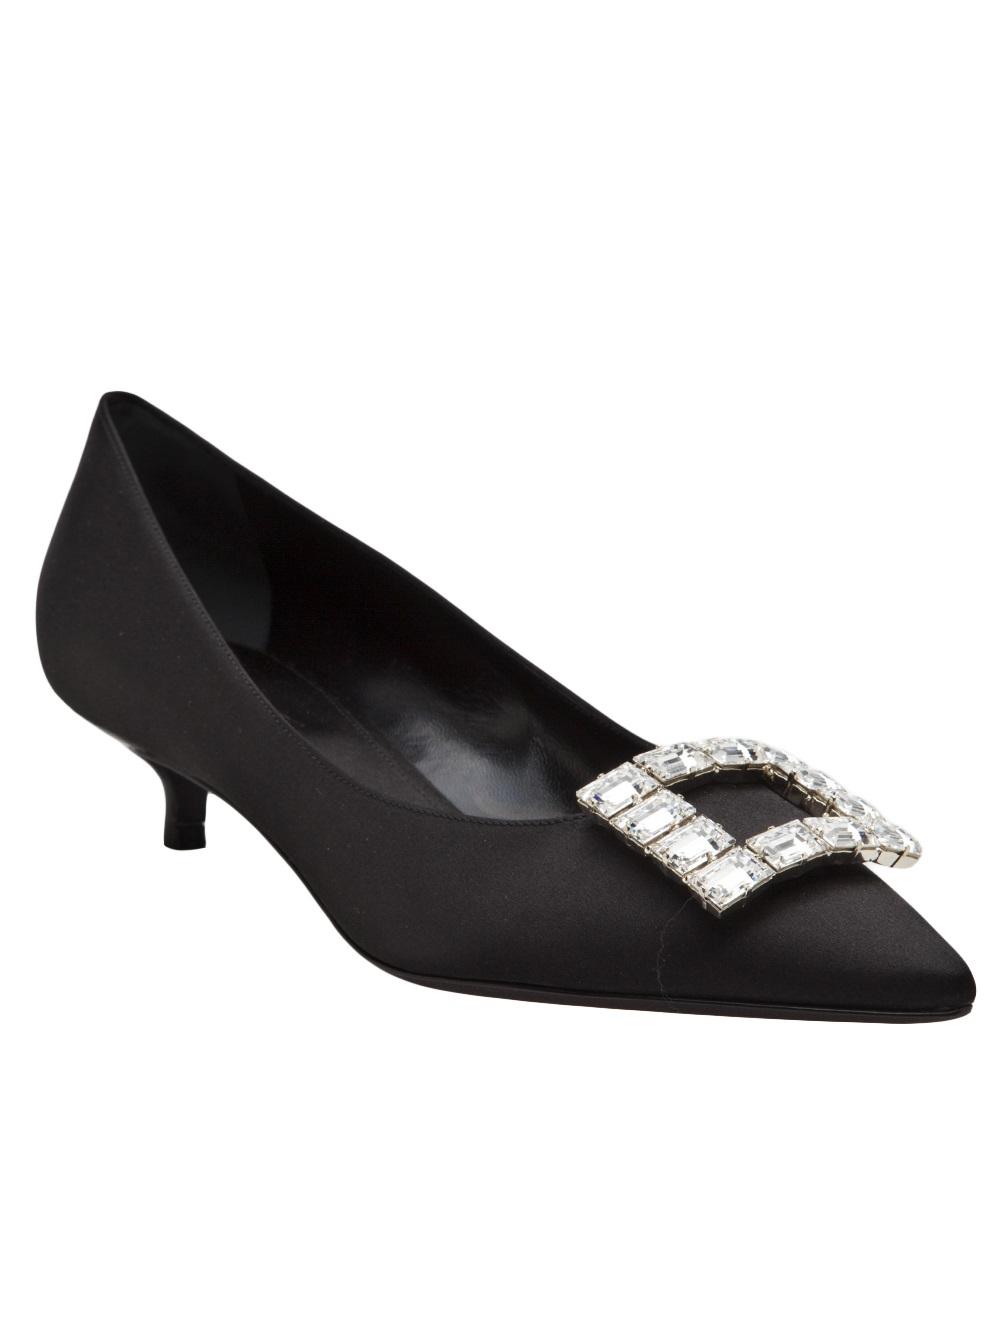 Jeweled Kitten Heel Shoes